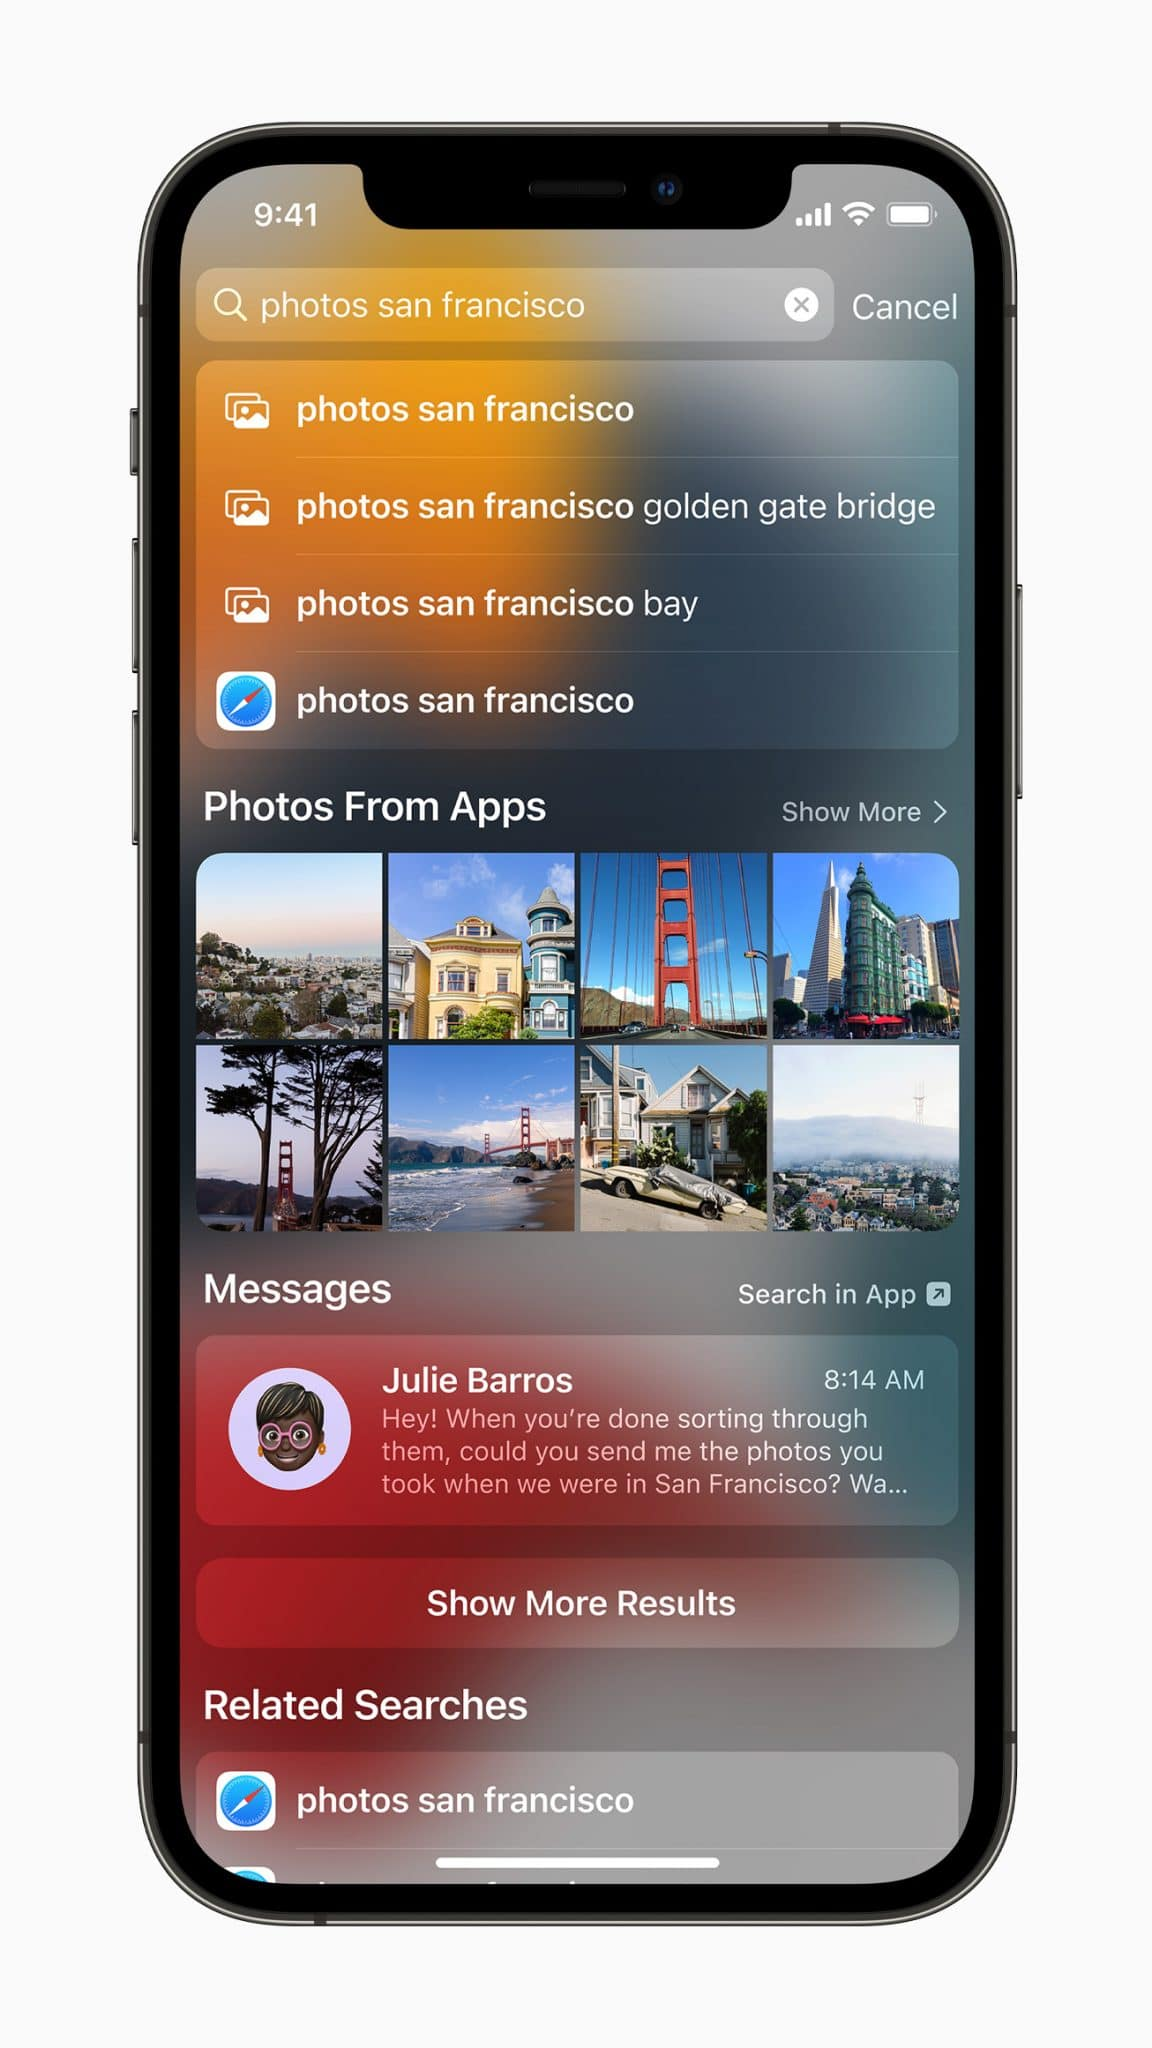 iOS 15 Spotlight